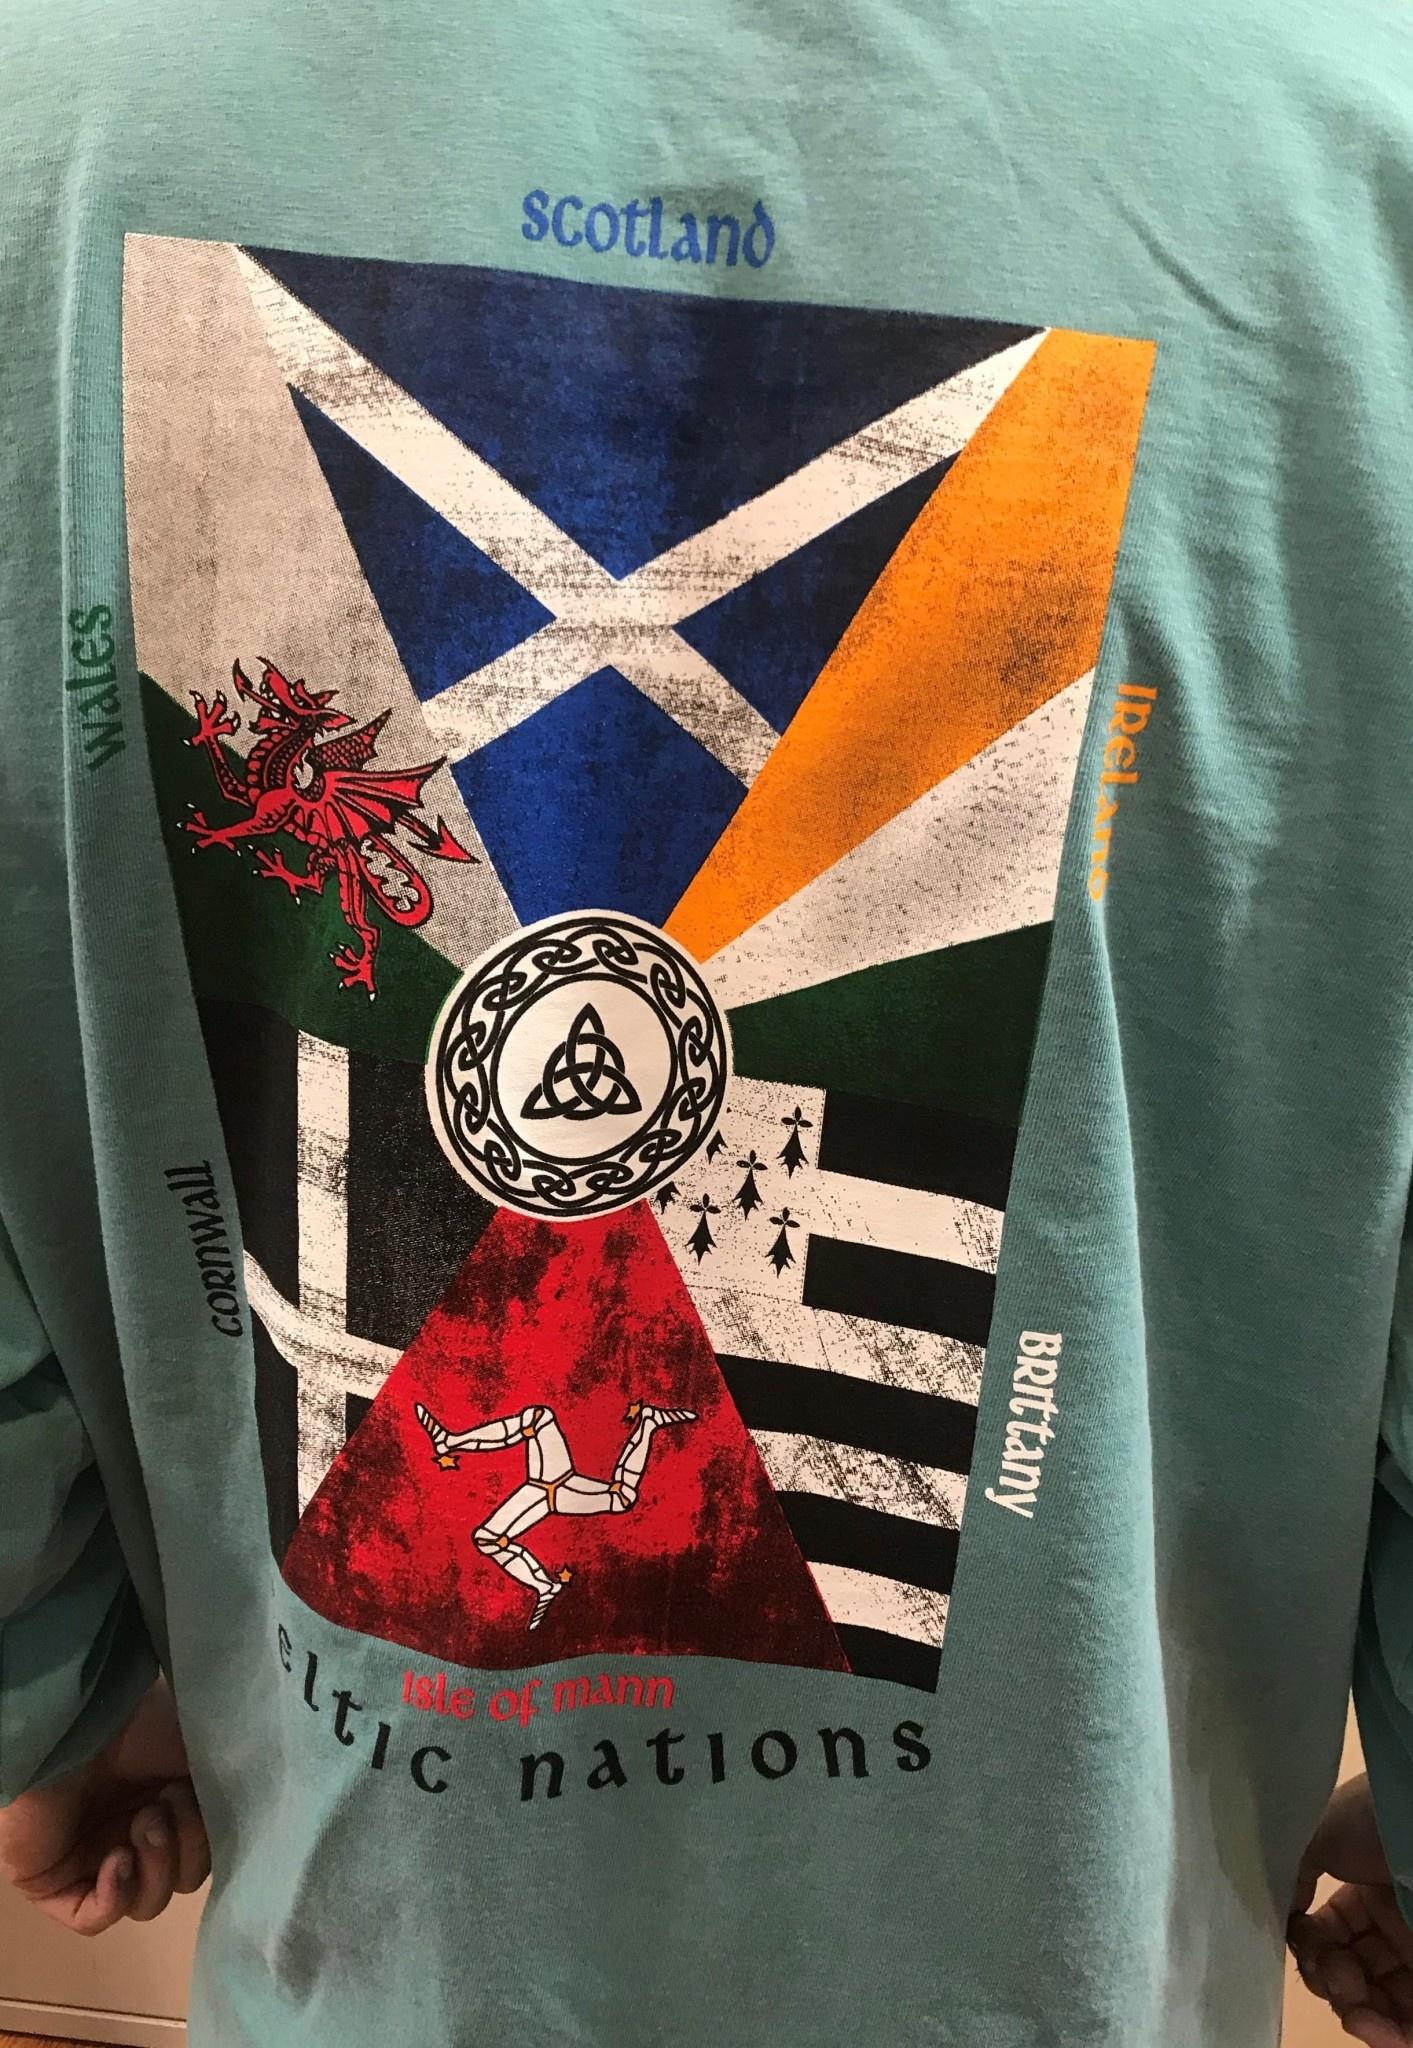 Shirt: Lg Slv Celt Nations